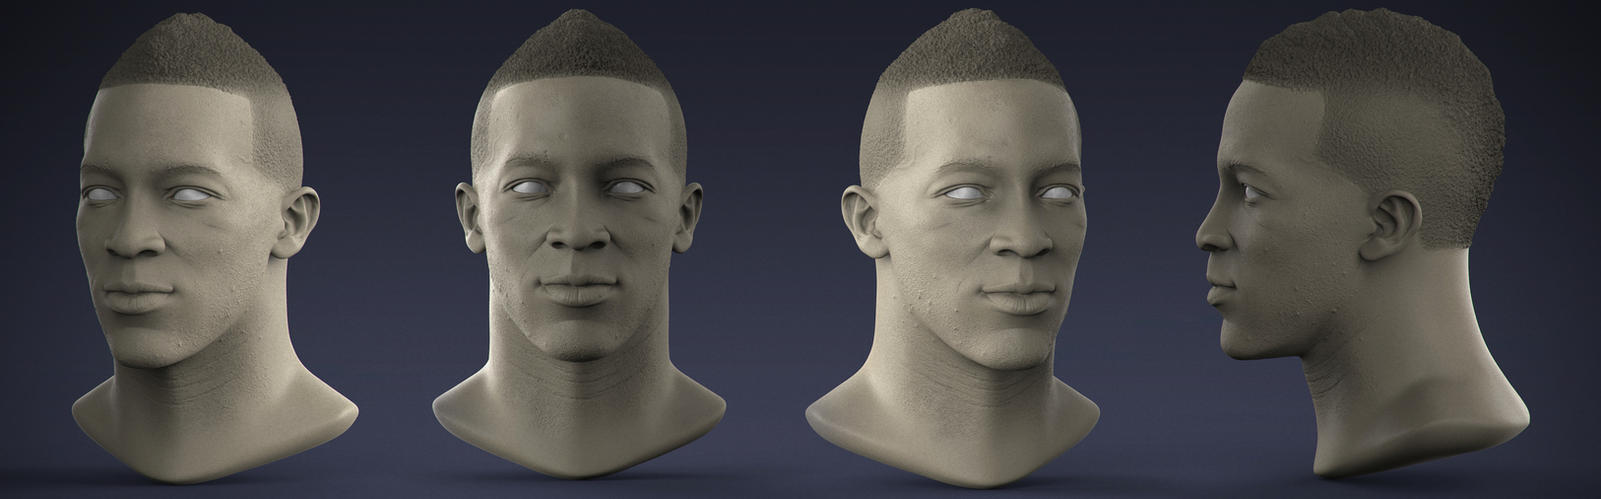 Demaryius Head Study by DeathMetalDan